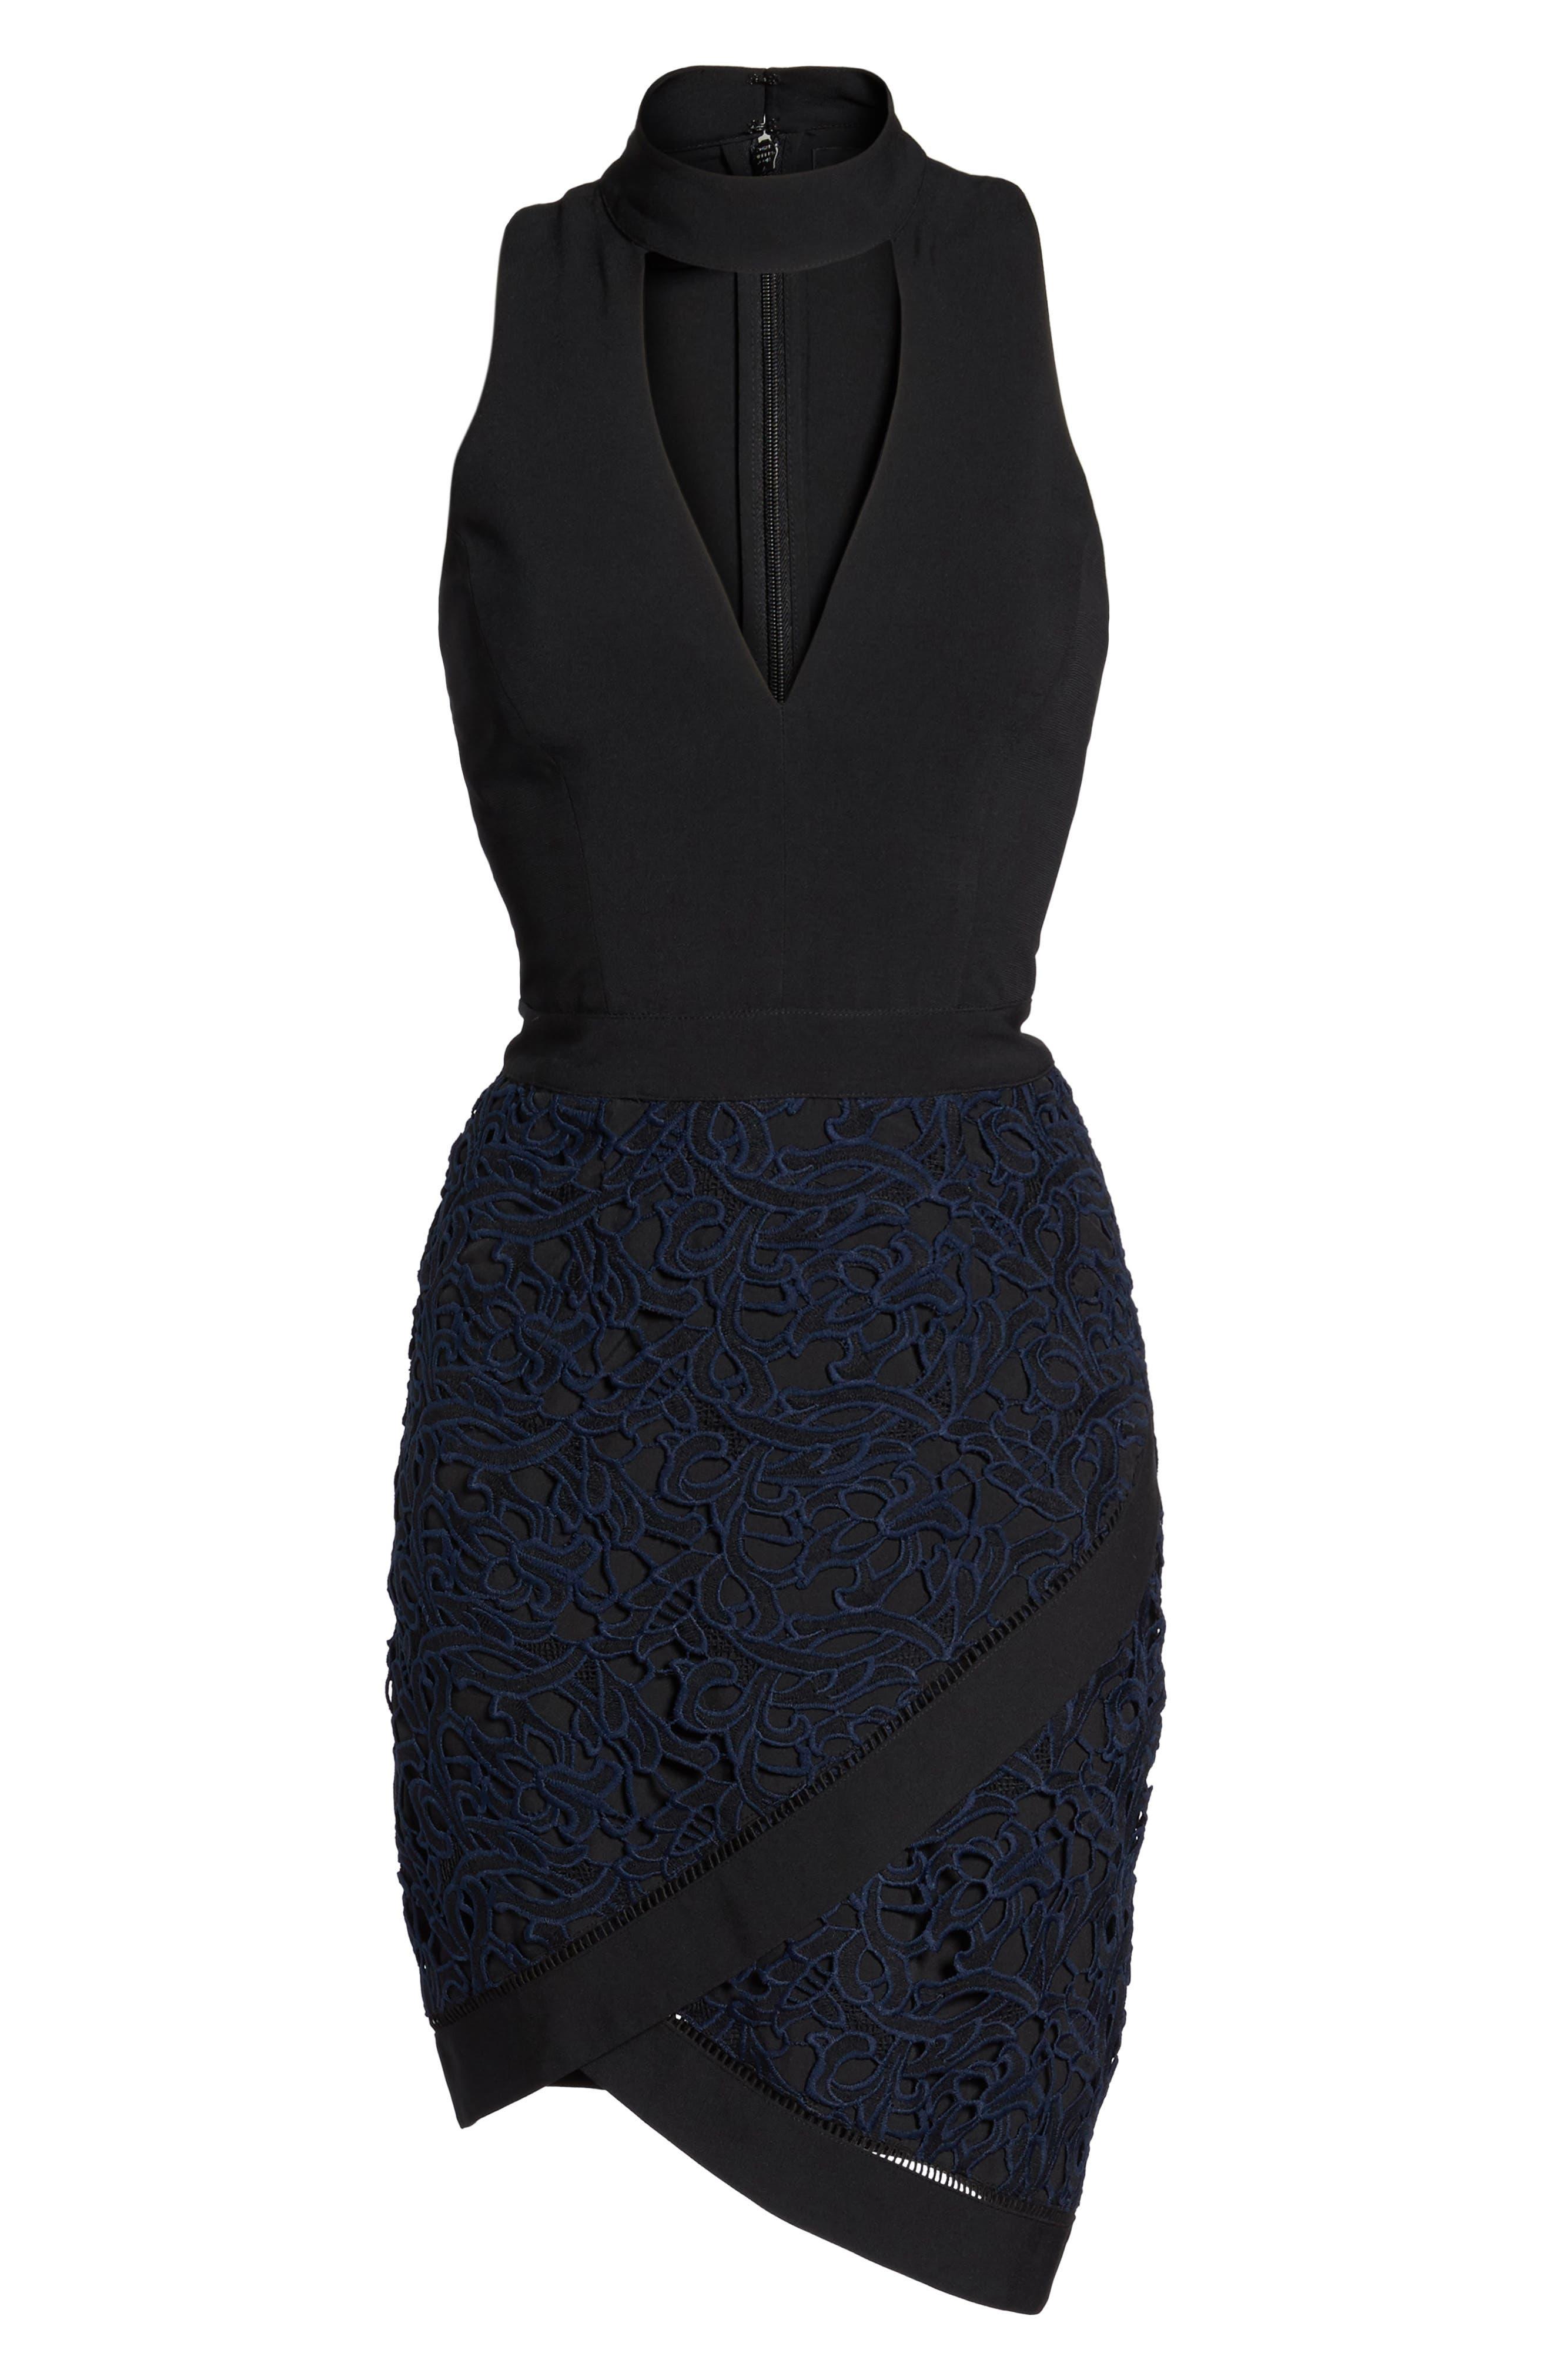 Choker Sheath Dress,                             Alternate thumbnail 6, color,                             001